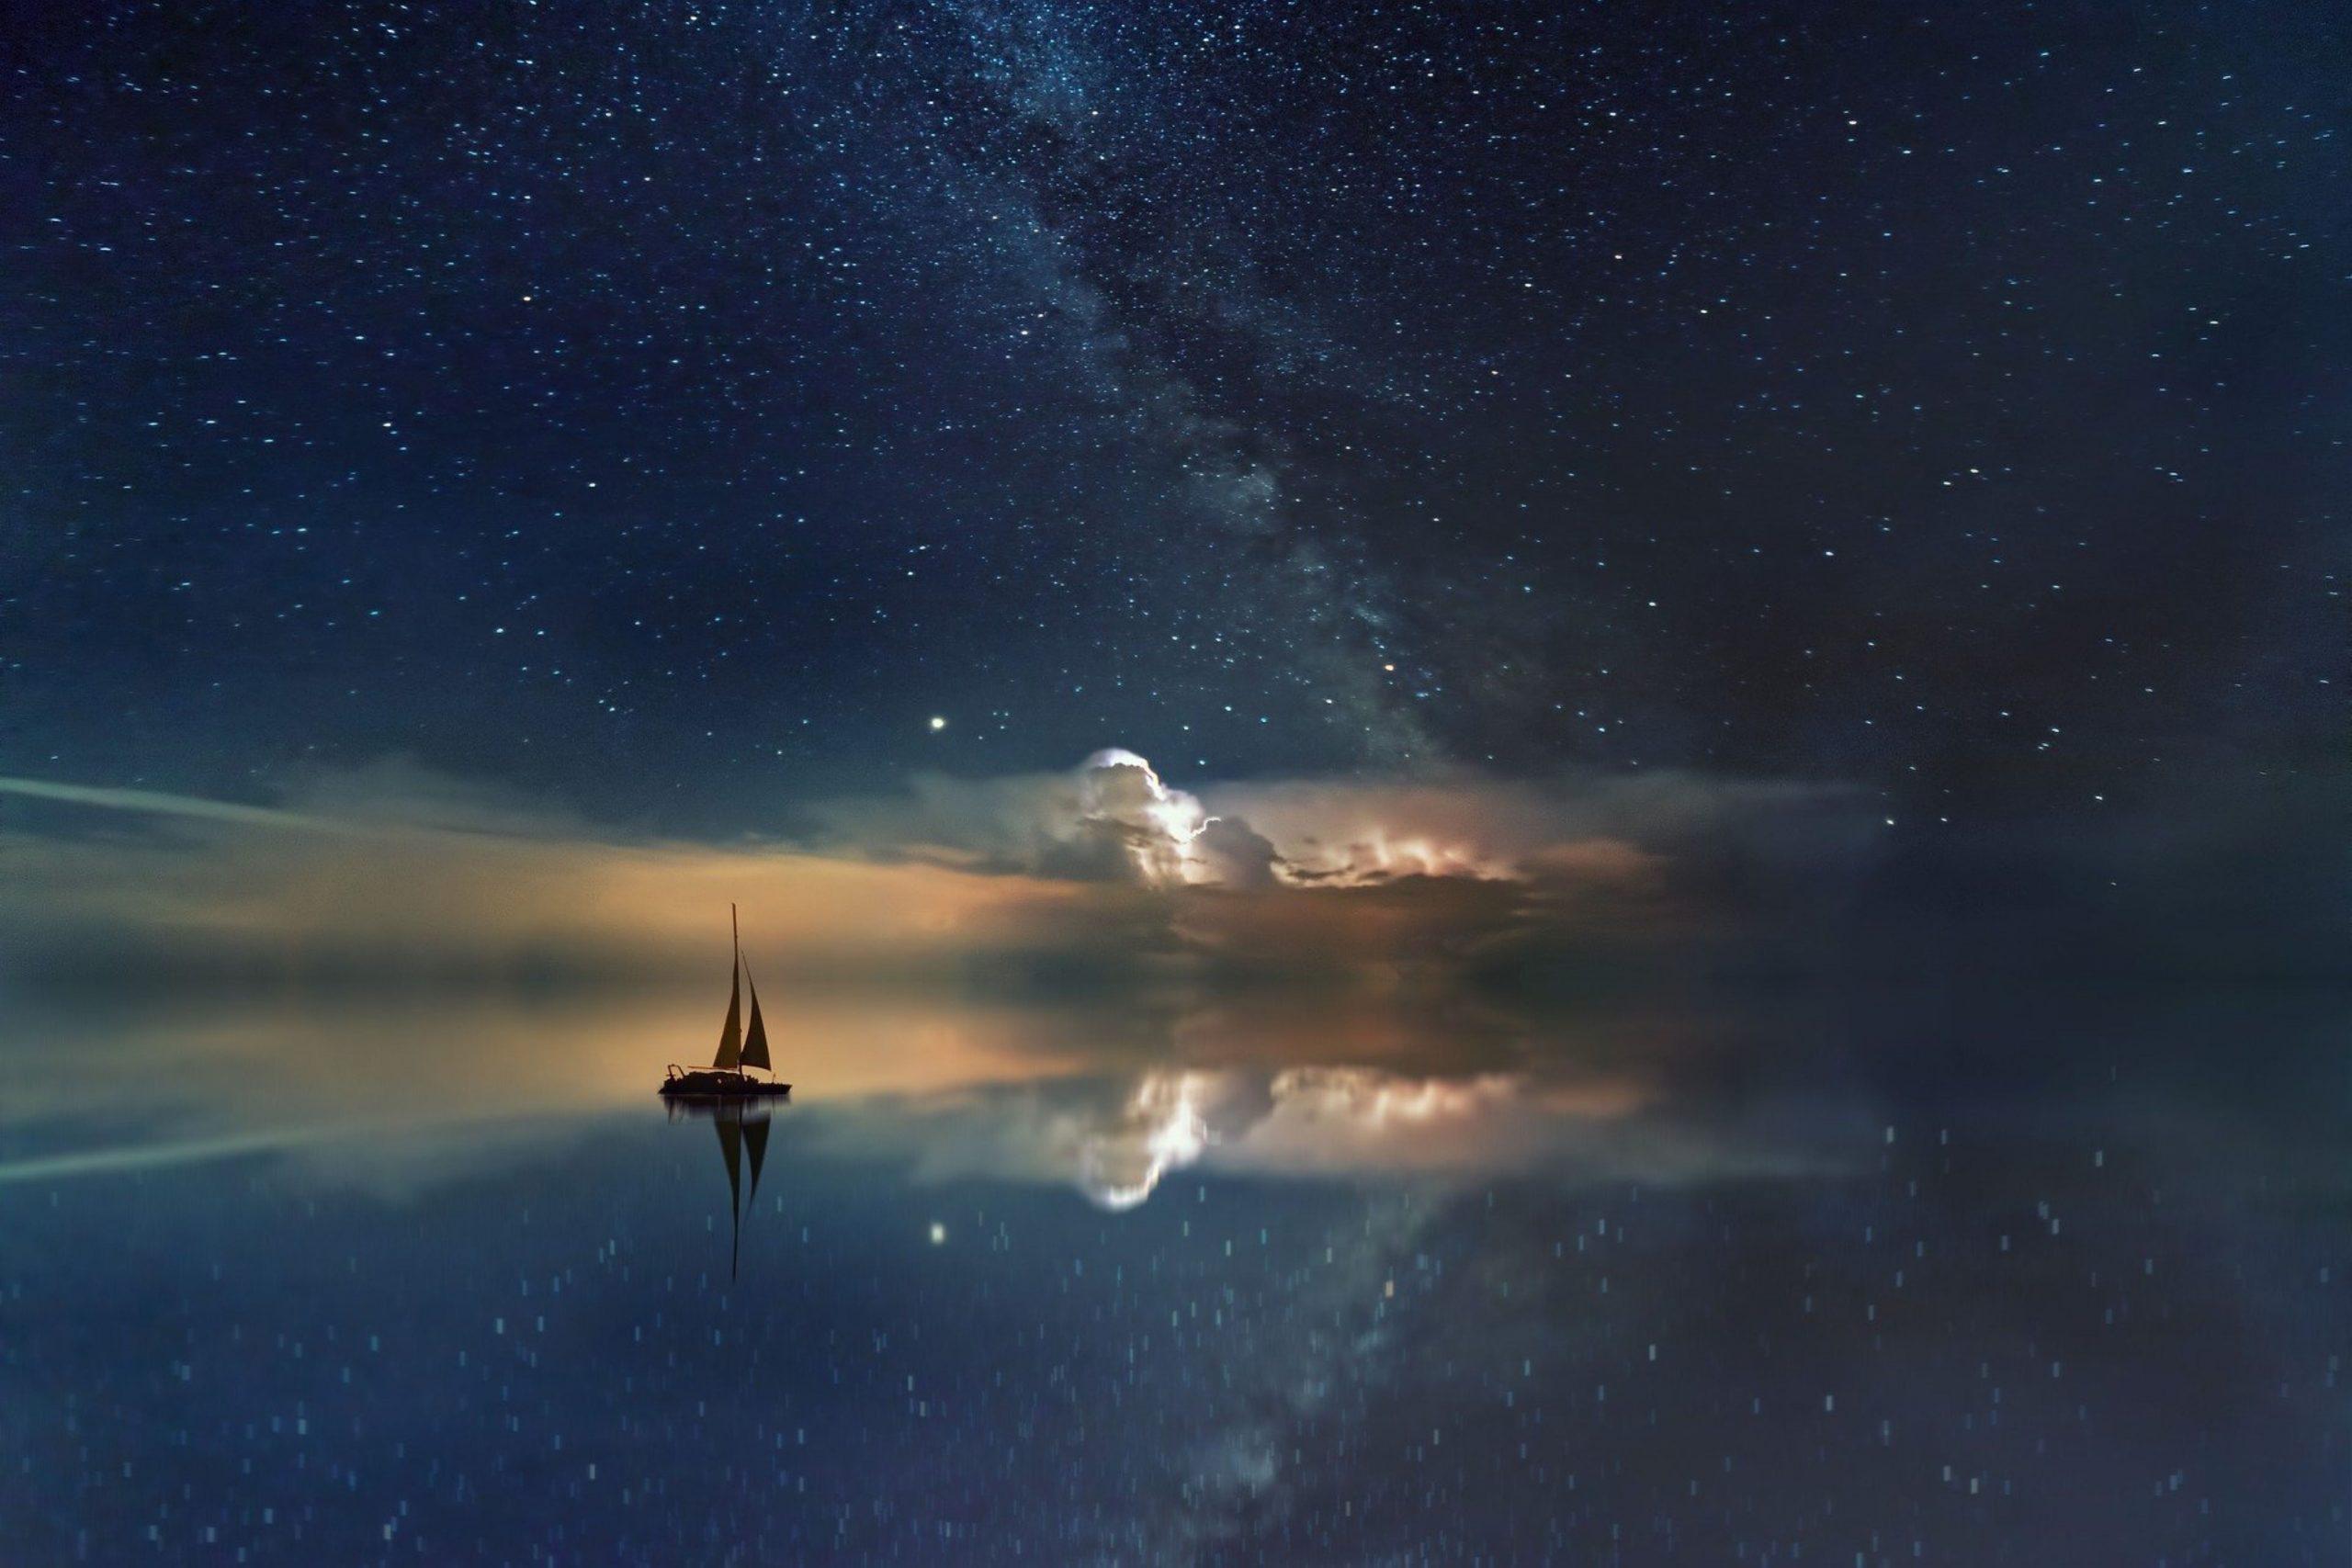 Océan étoilé et bateau-redimensionné